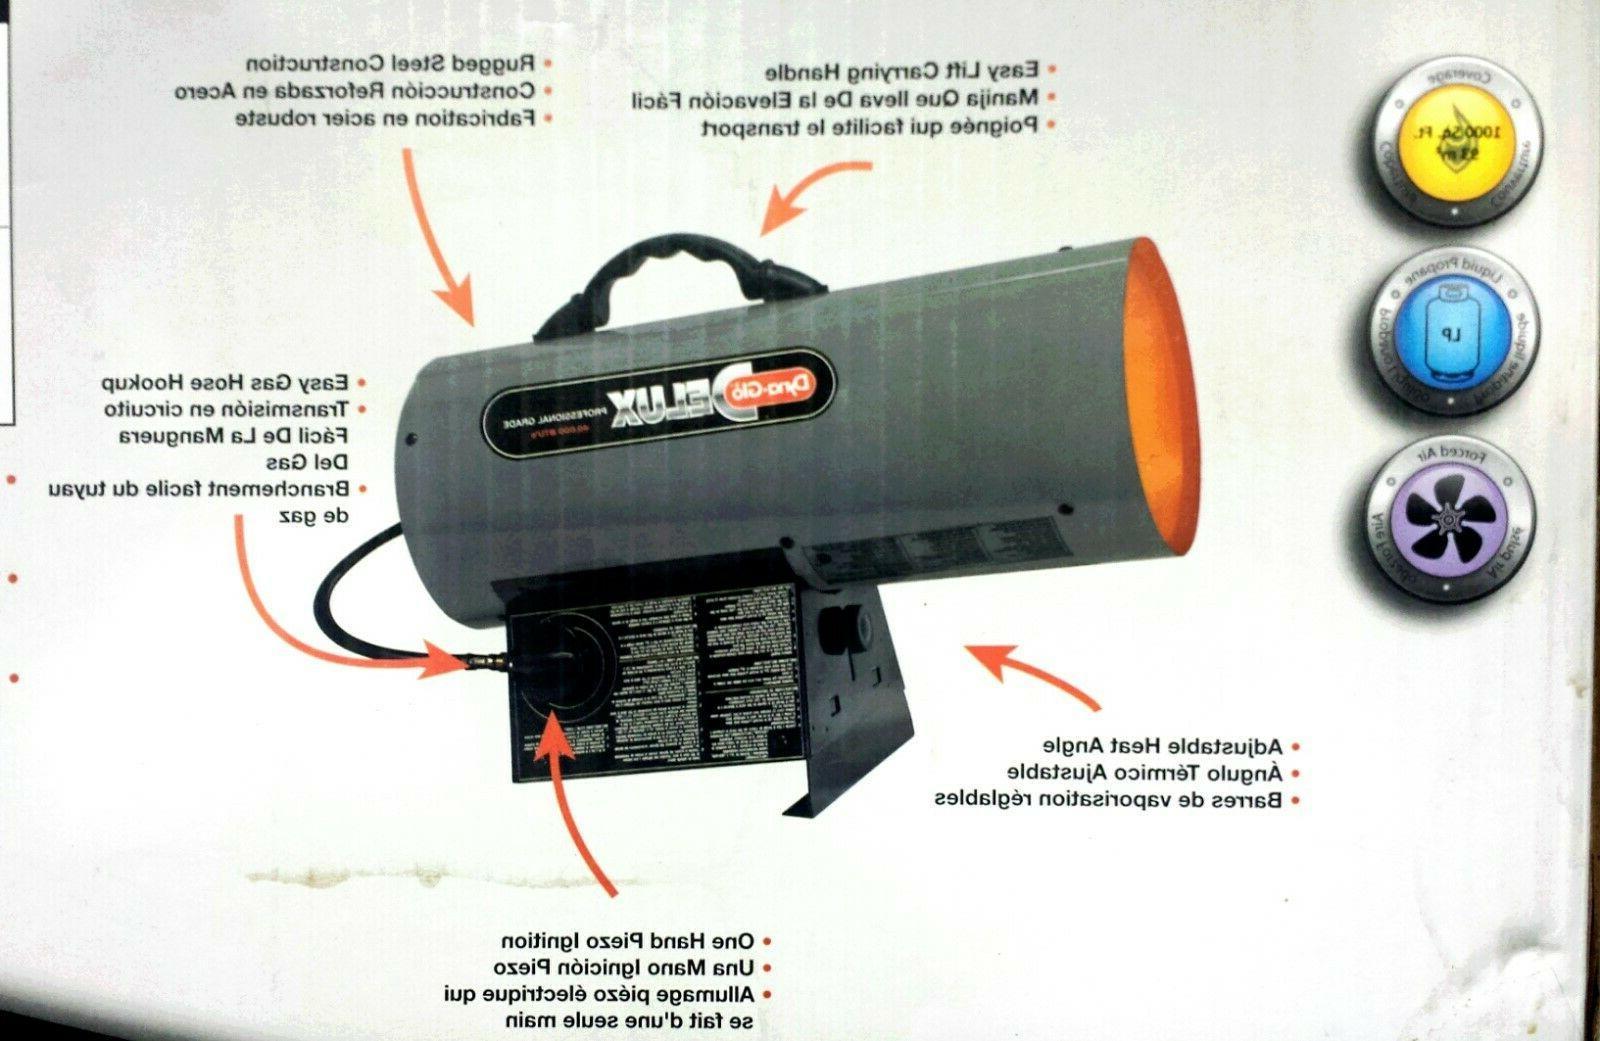 Dyna BTU Propane Gas Air Heater Garage